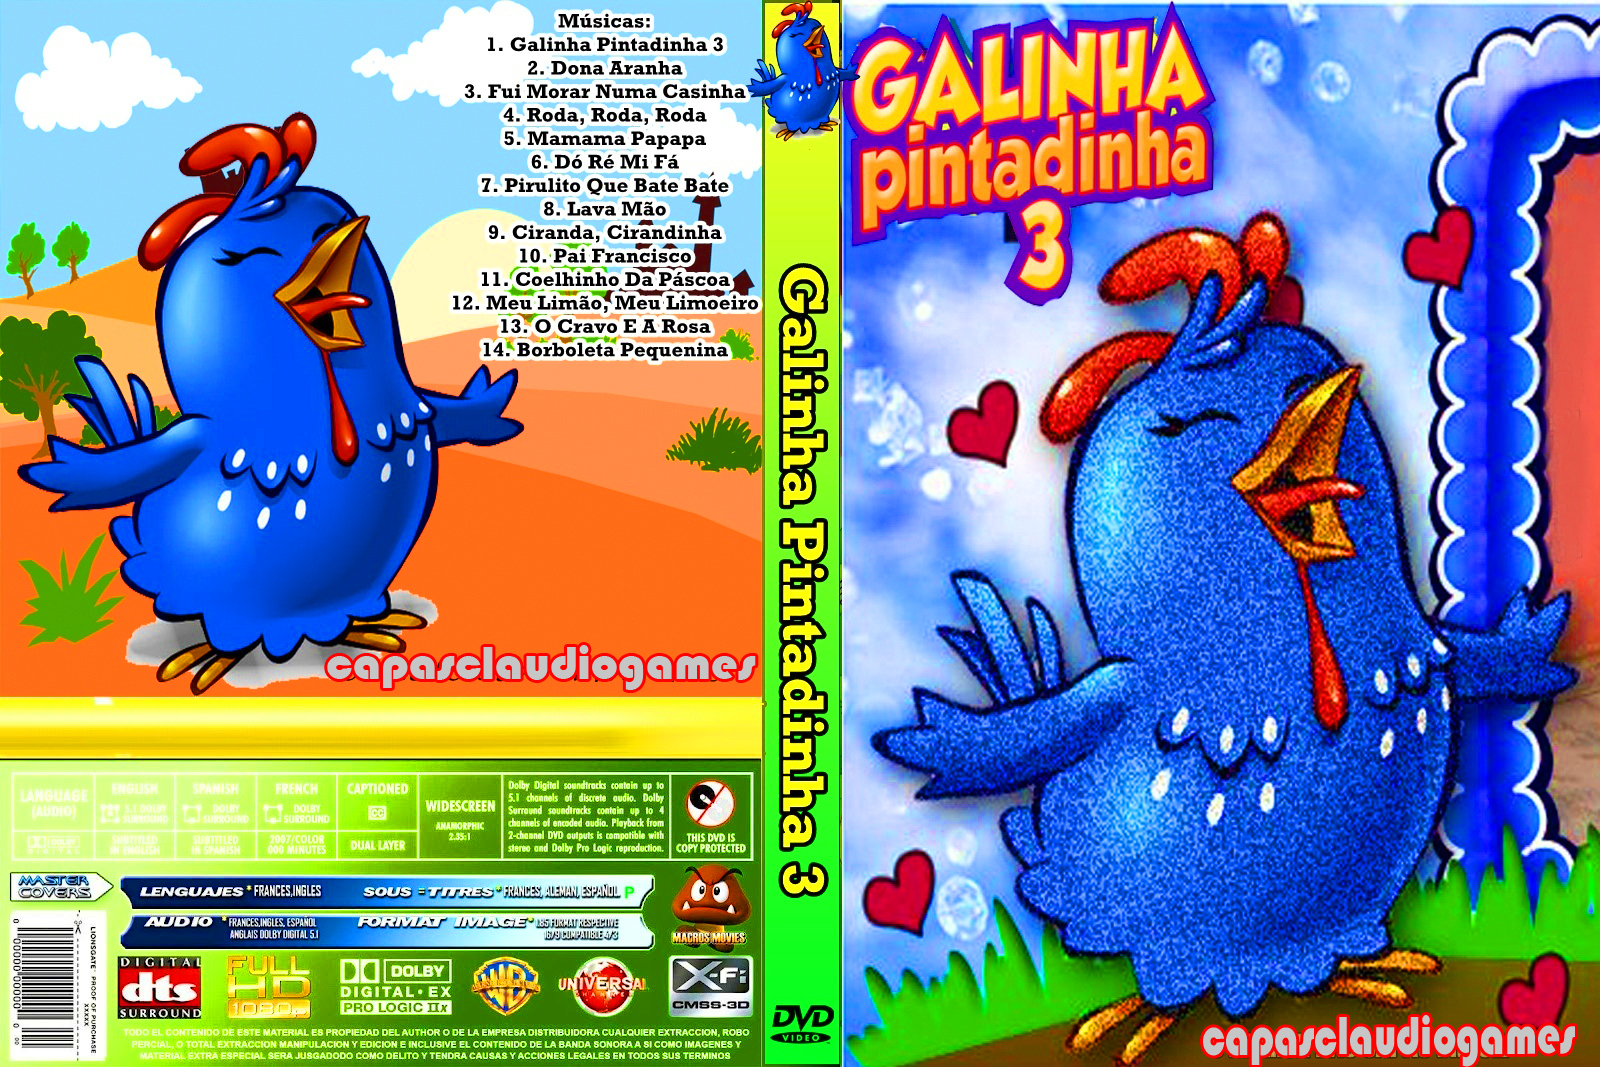 https://www.dvdrviatorrent.info/galinha-pintadinha-volumes-1-4-2014-dvdr-torrent-uploaded/